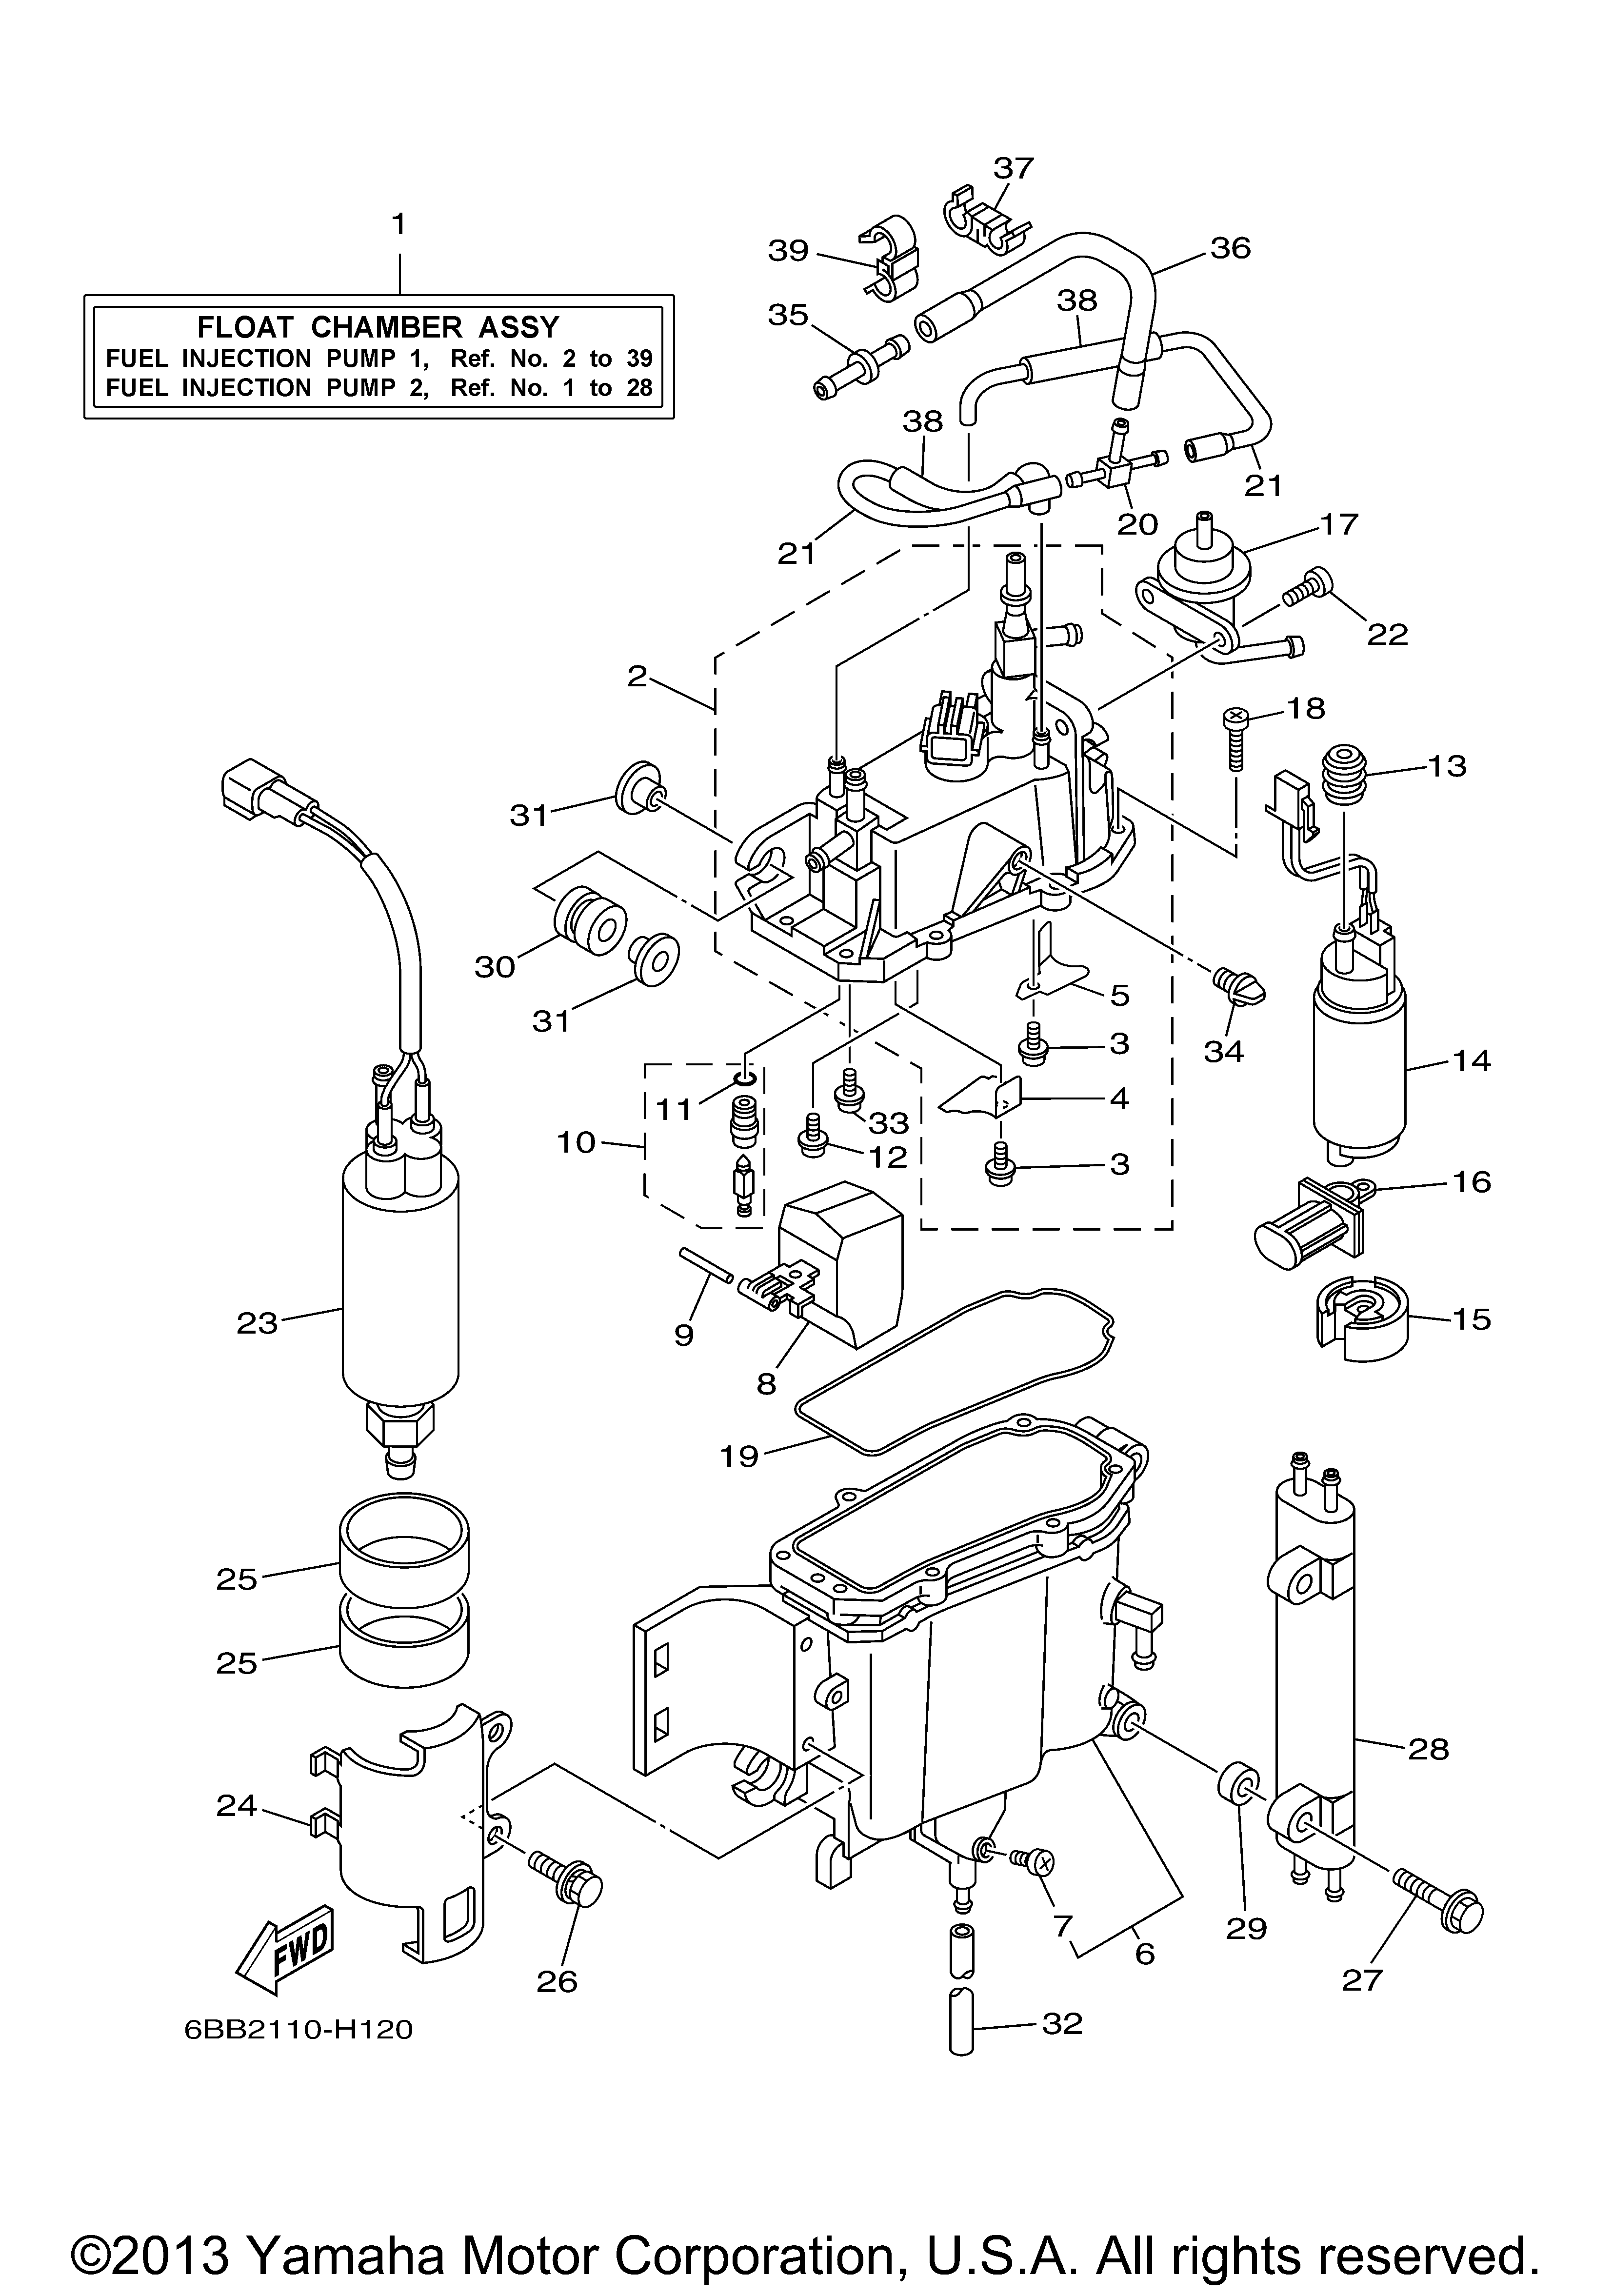 Yamaha F250 Outboard Wiring Diagram